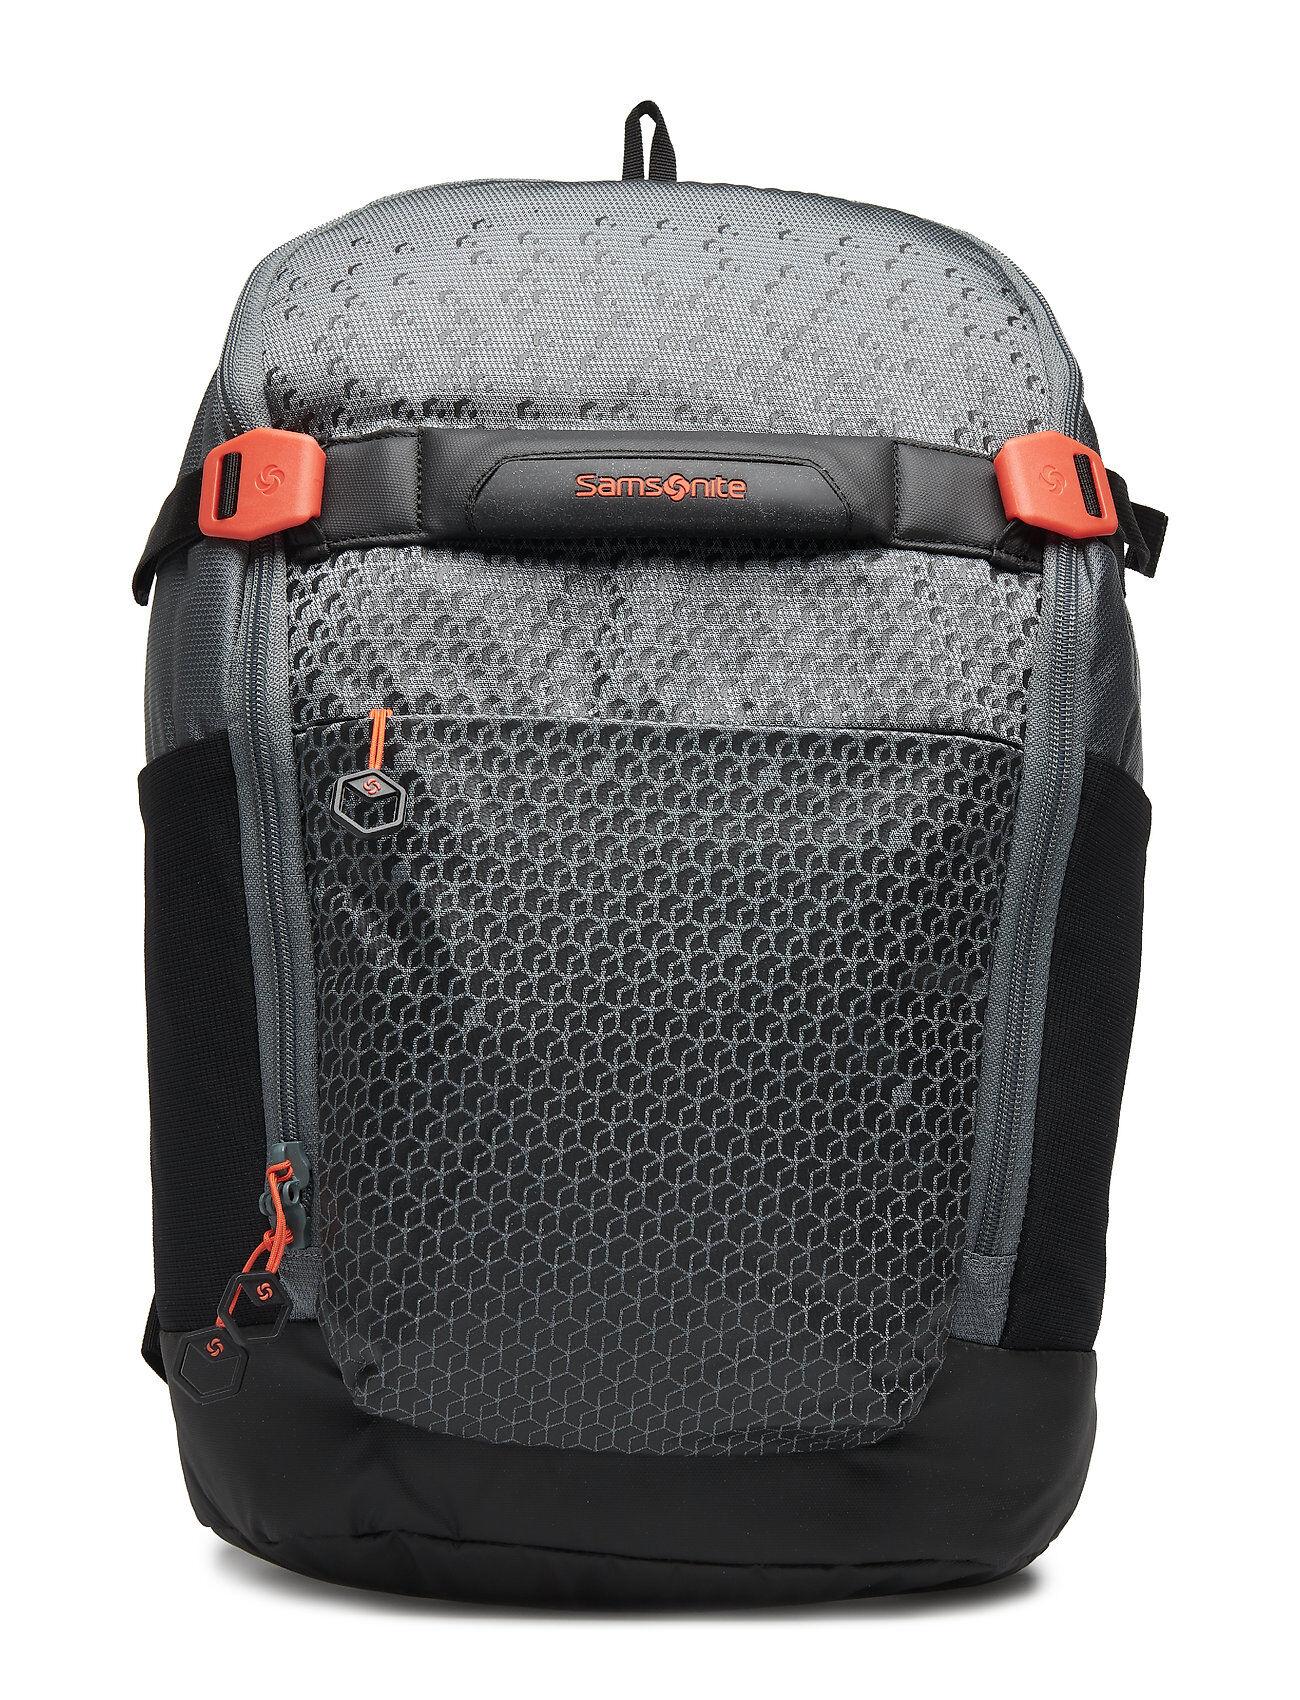 Samsonite Hexa Packs Latptop Backpack S Day